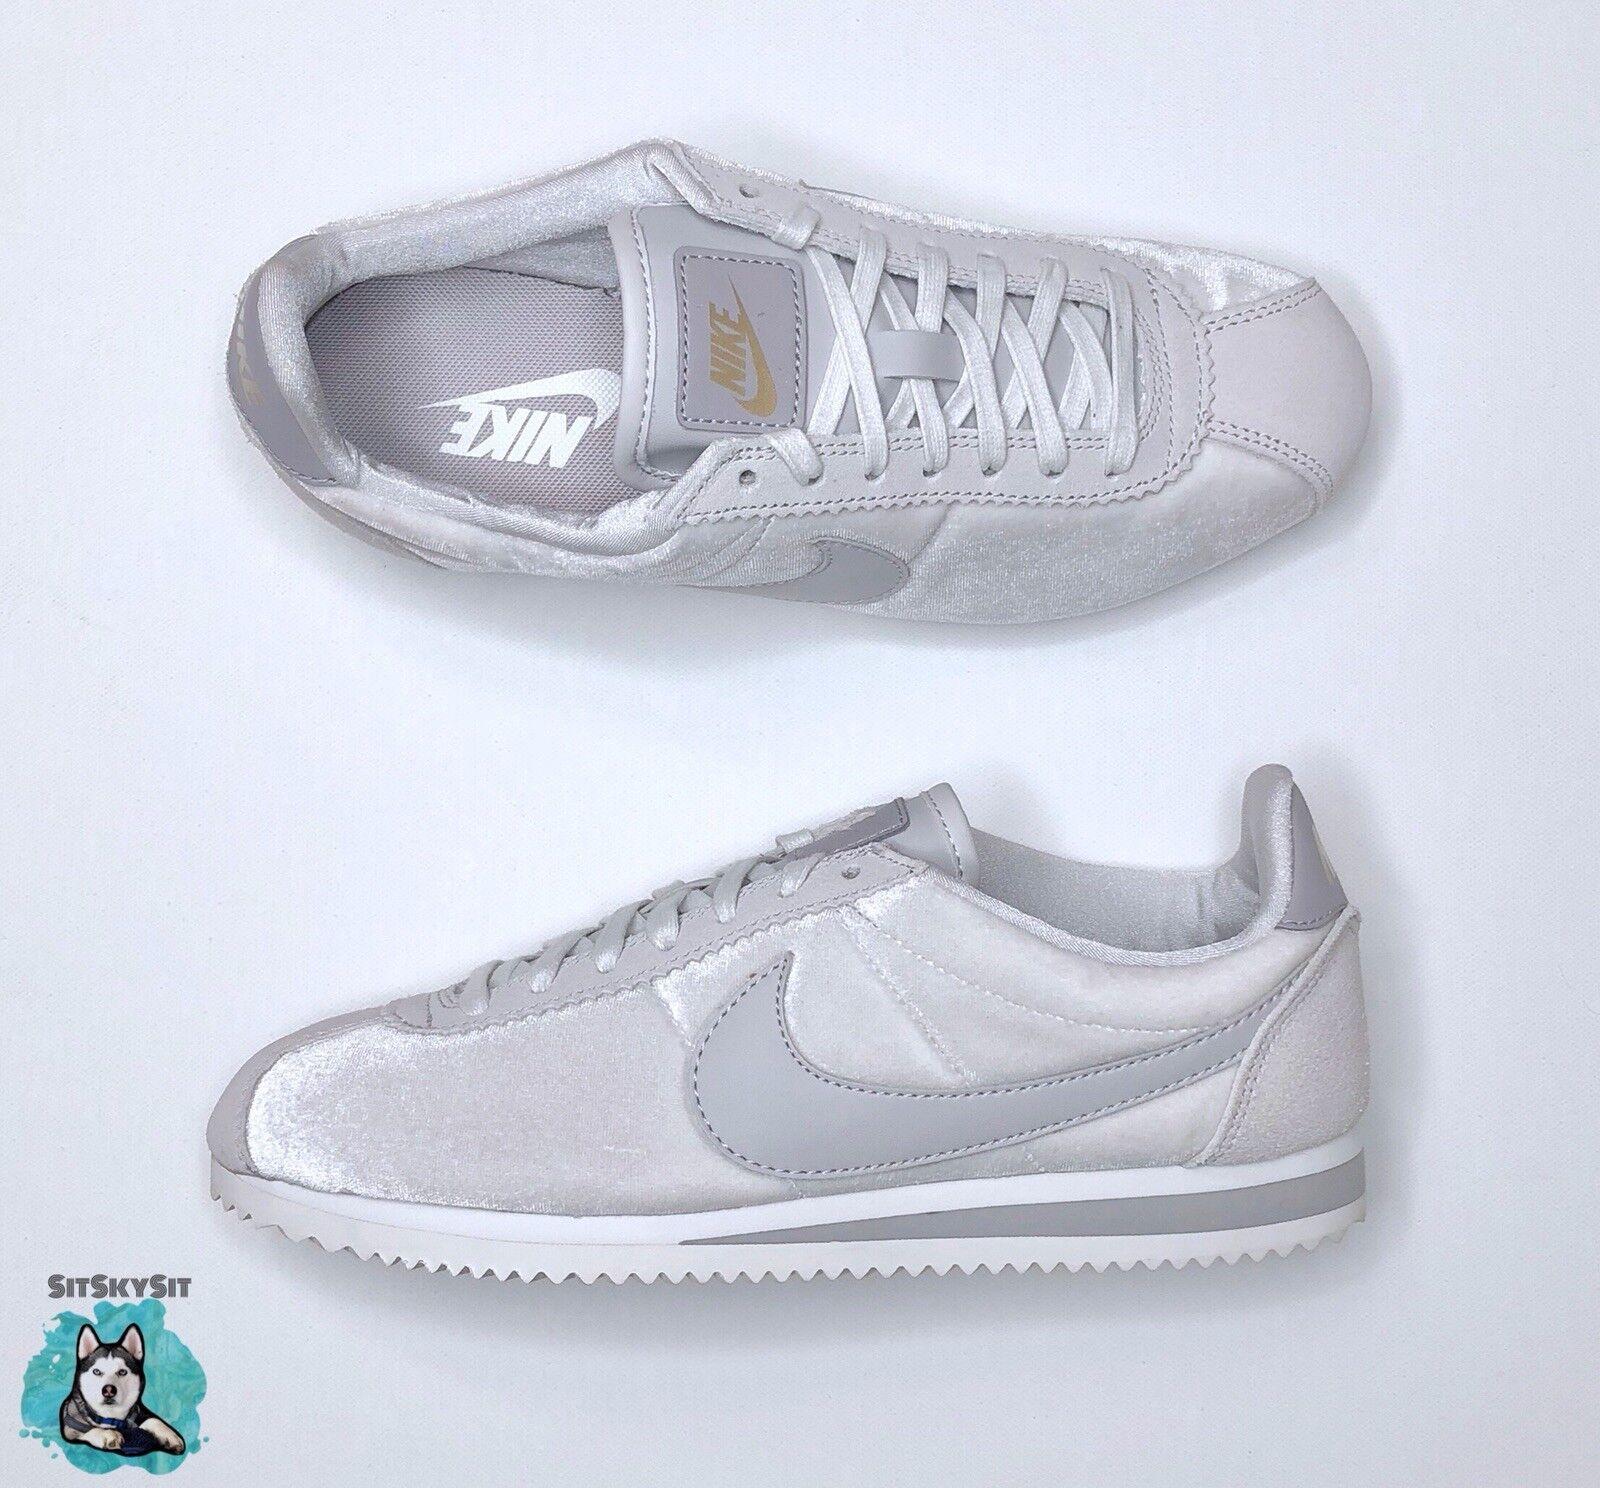 new style af8ce 351f2 Nike Classic Classic Classic Cortez SE Vast Grey White 902856-011 Women Size  8 6d8fbc